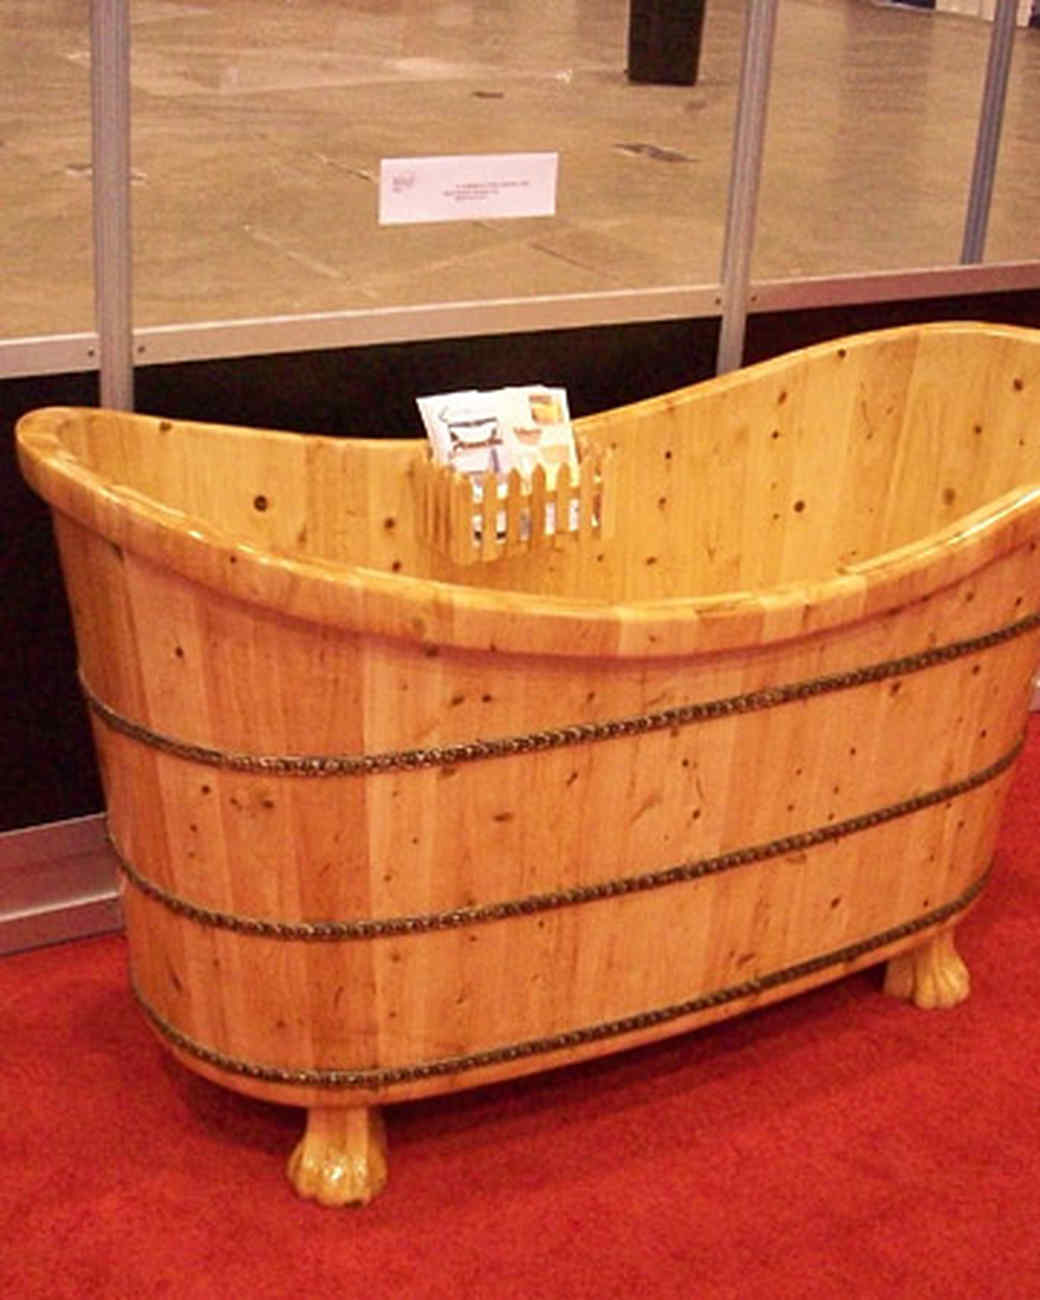 str_bamboo_bathtub.jpg